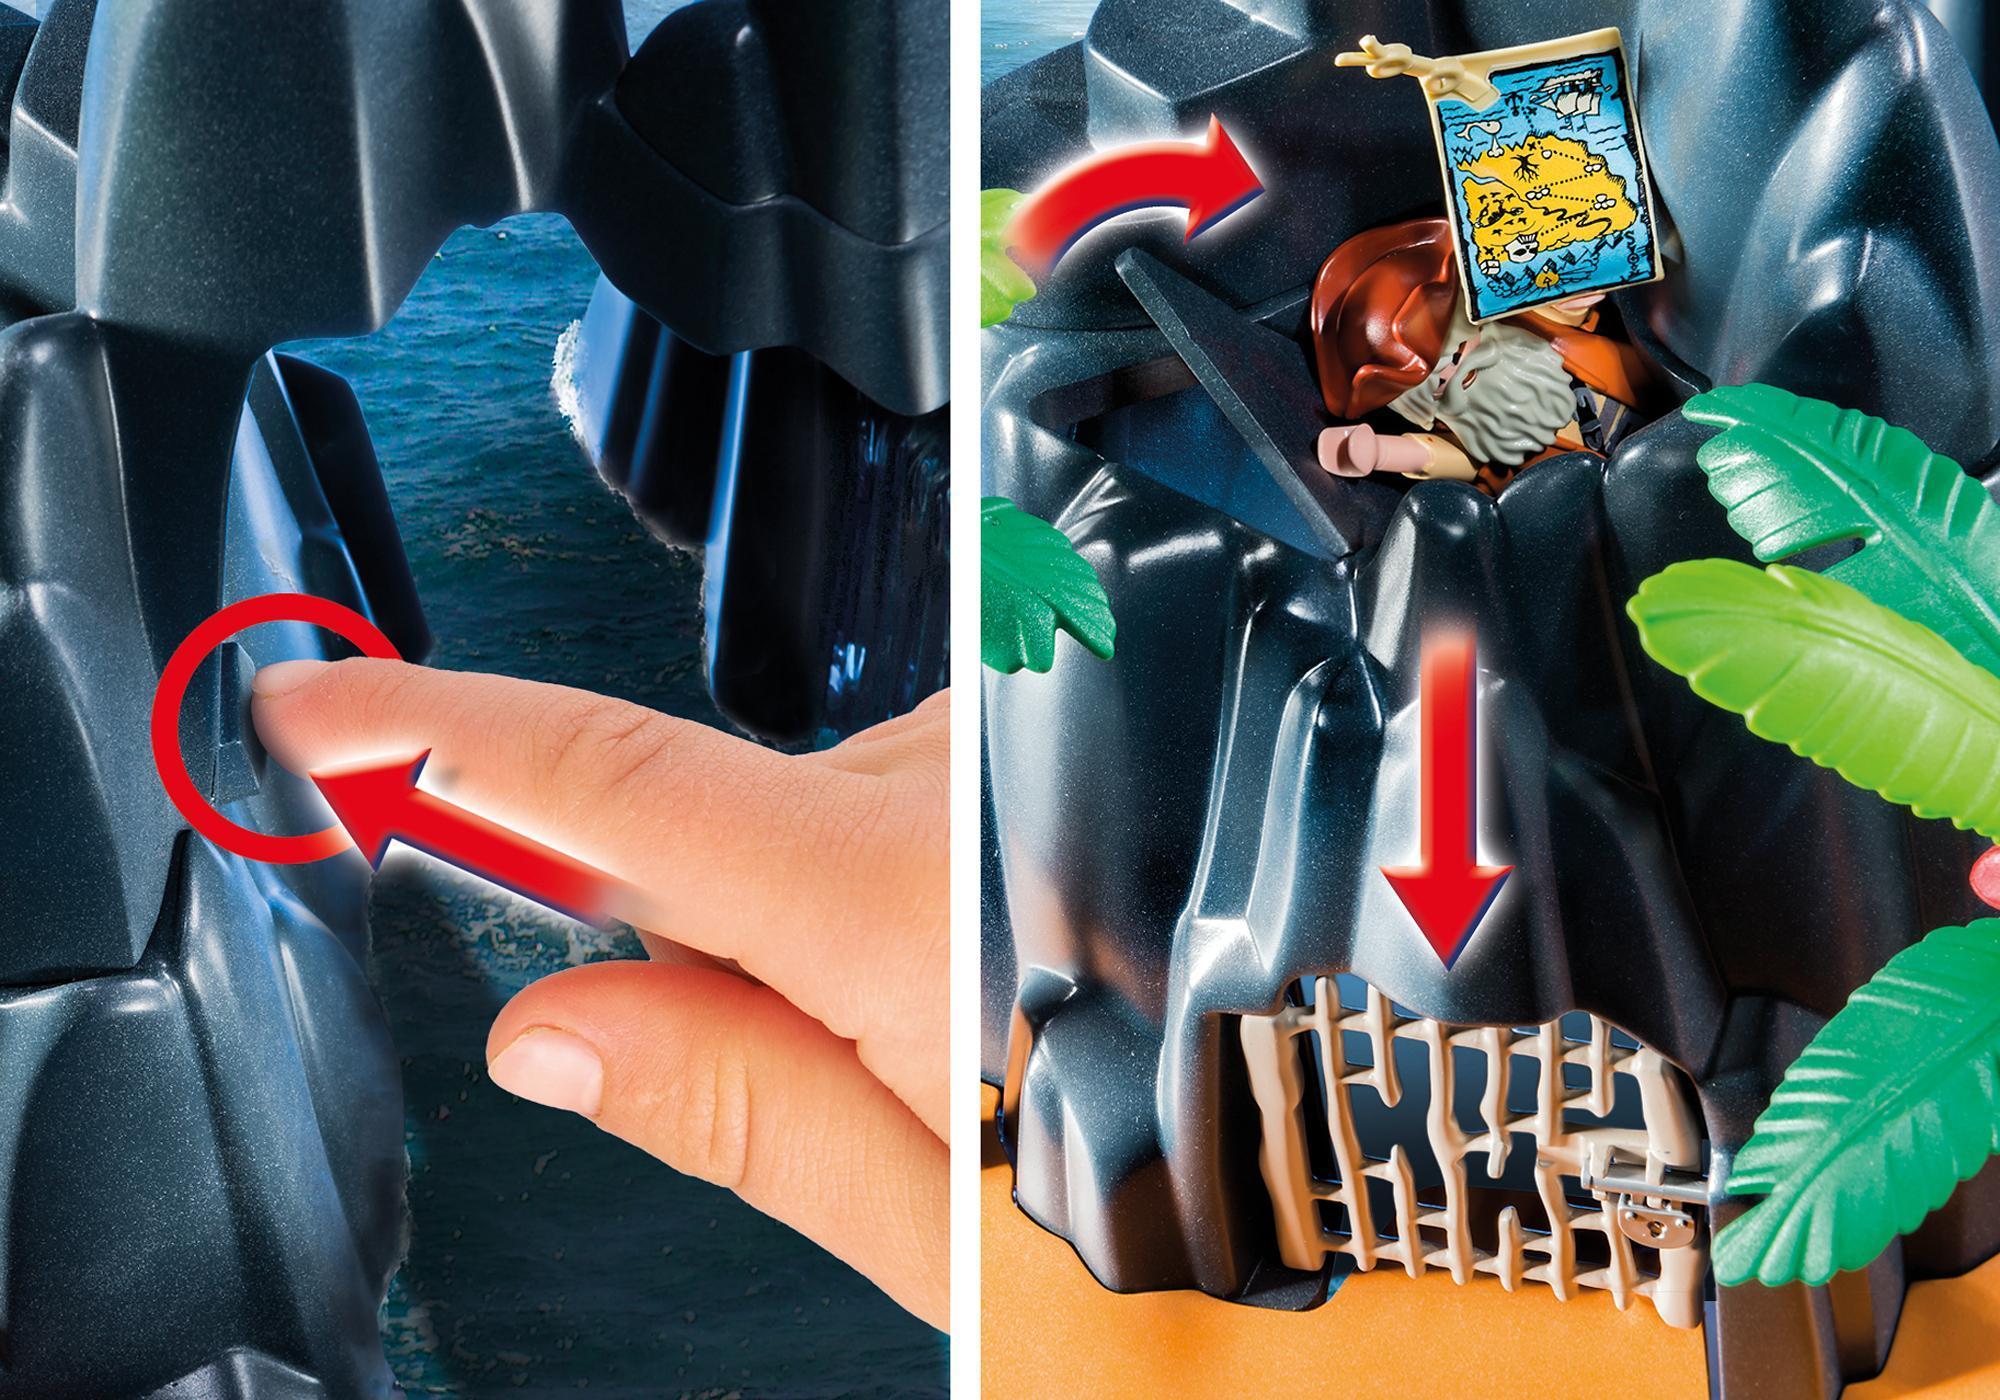 http://media.playmobil.com/i/playmobil/6679_product_extra2/Isola del tesoro fortificata